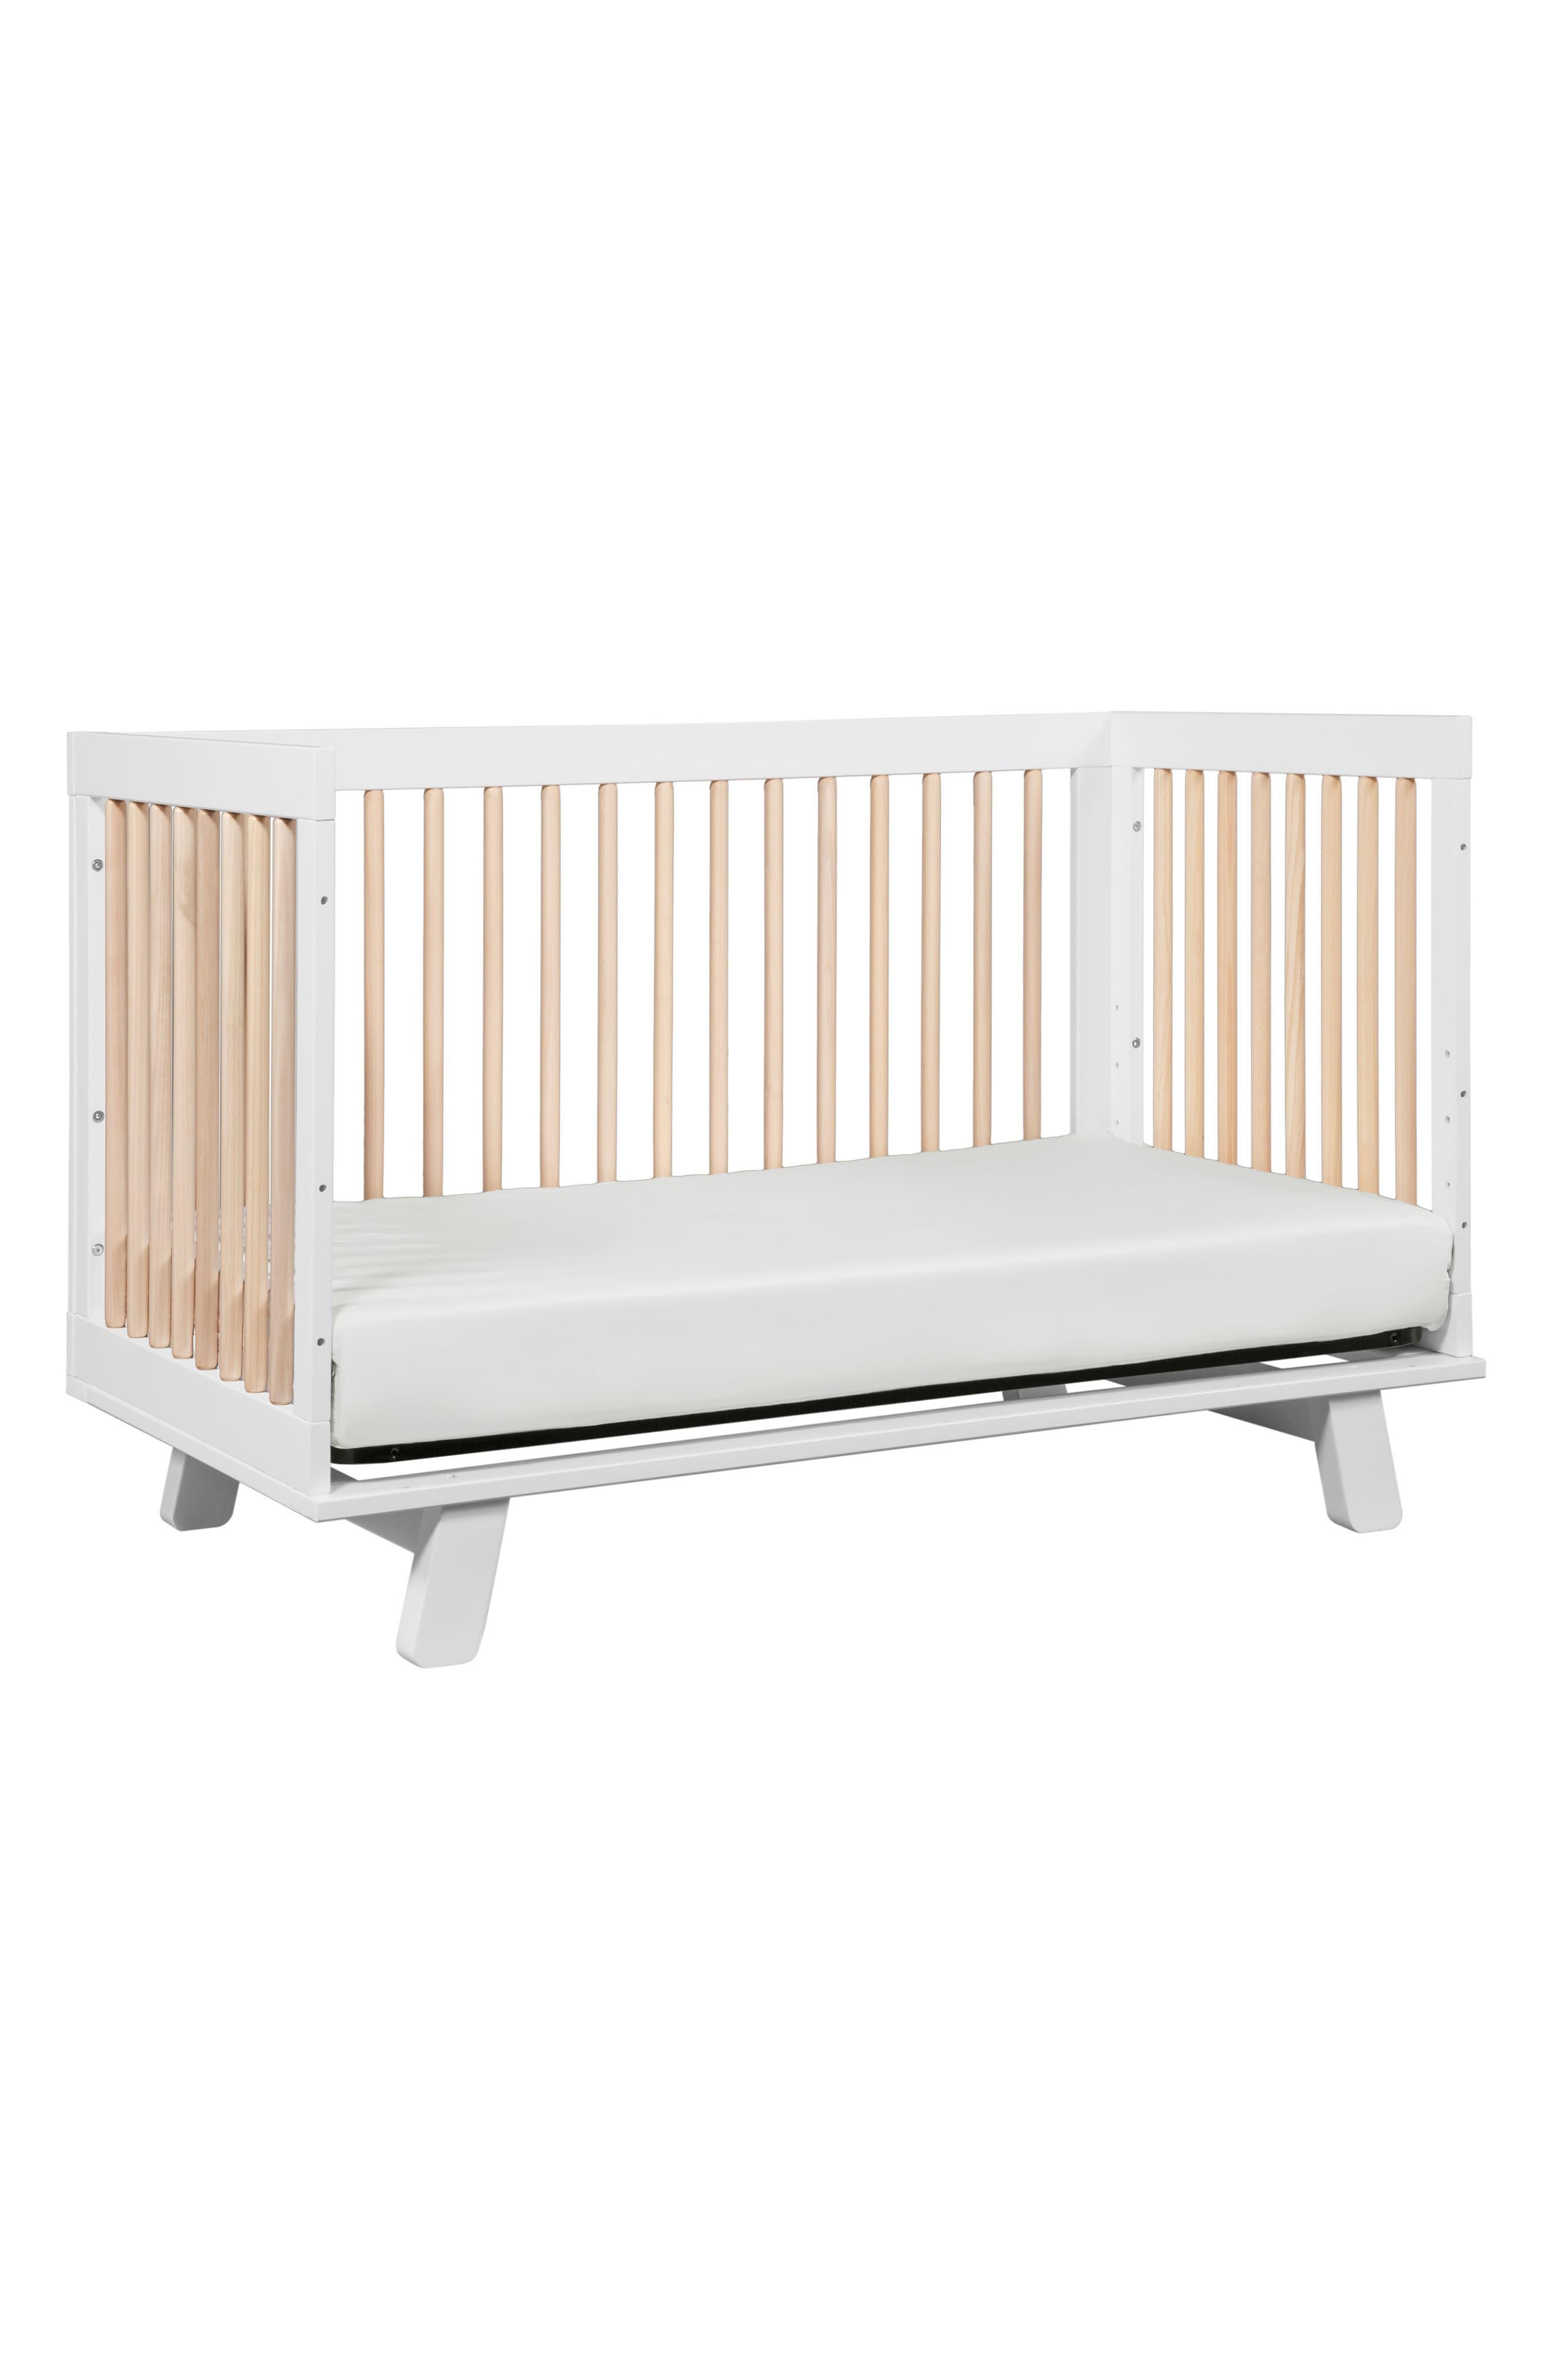 'Hudson' 3-in-1 Convertible Crib,                             Alternate thumbnail 14, color,